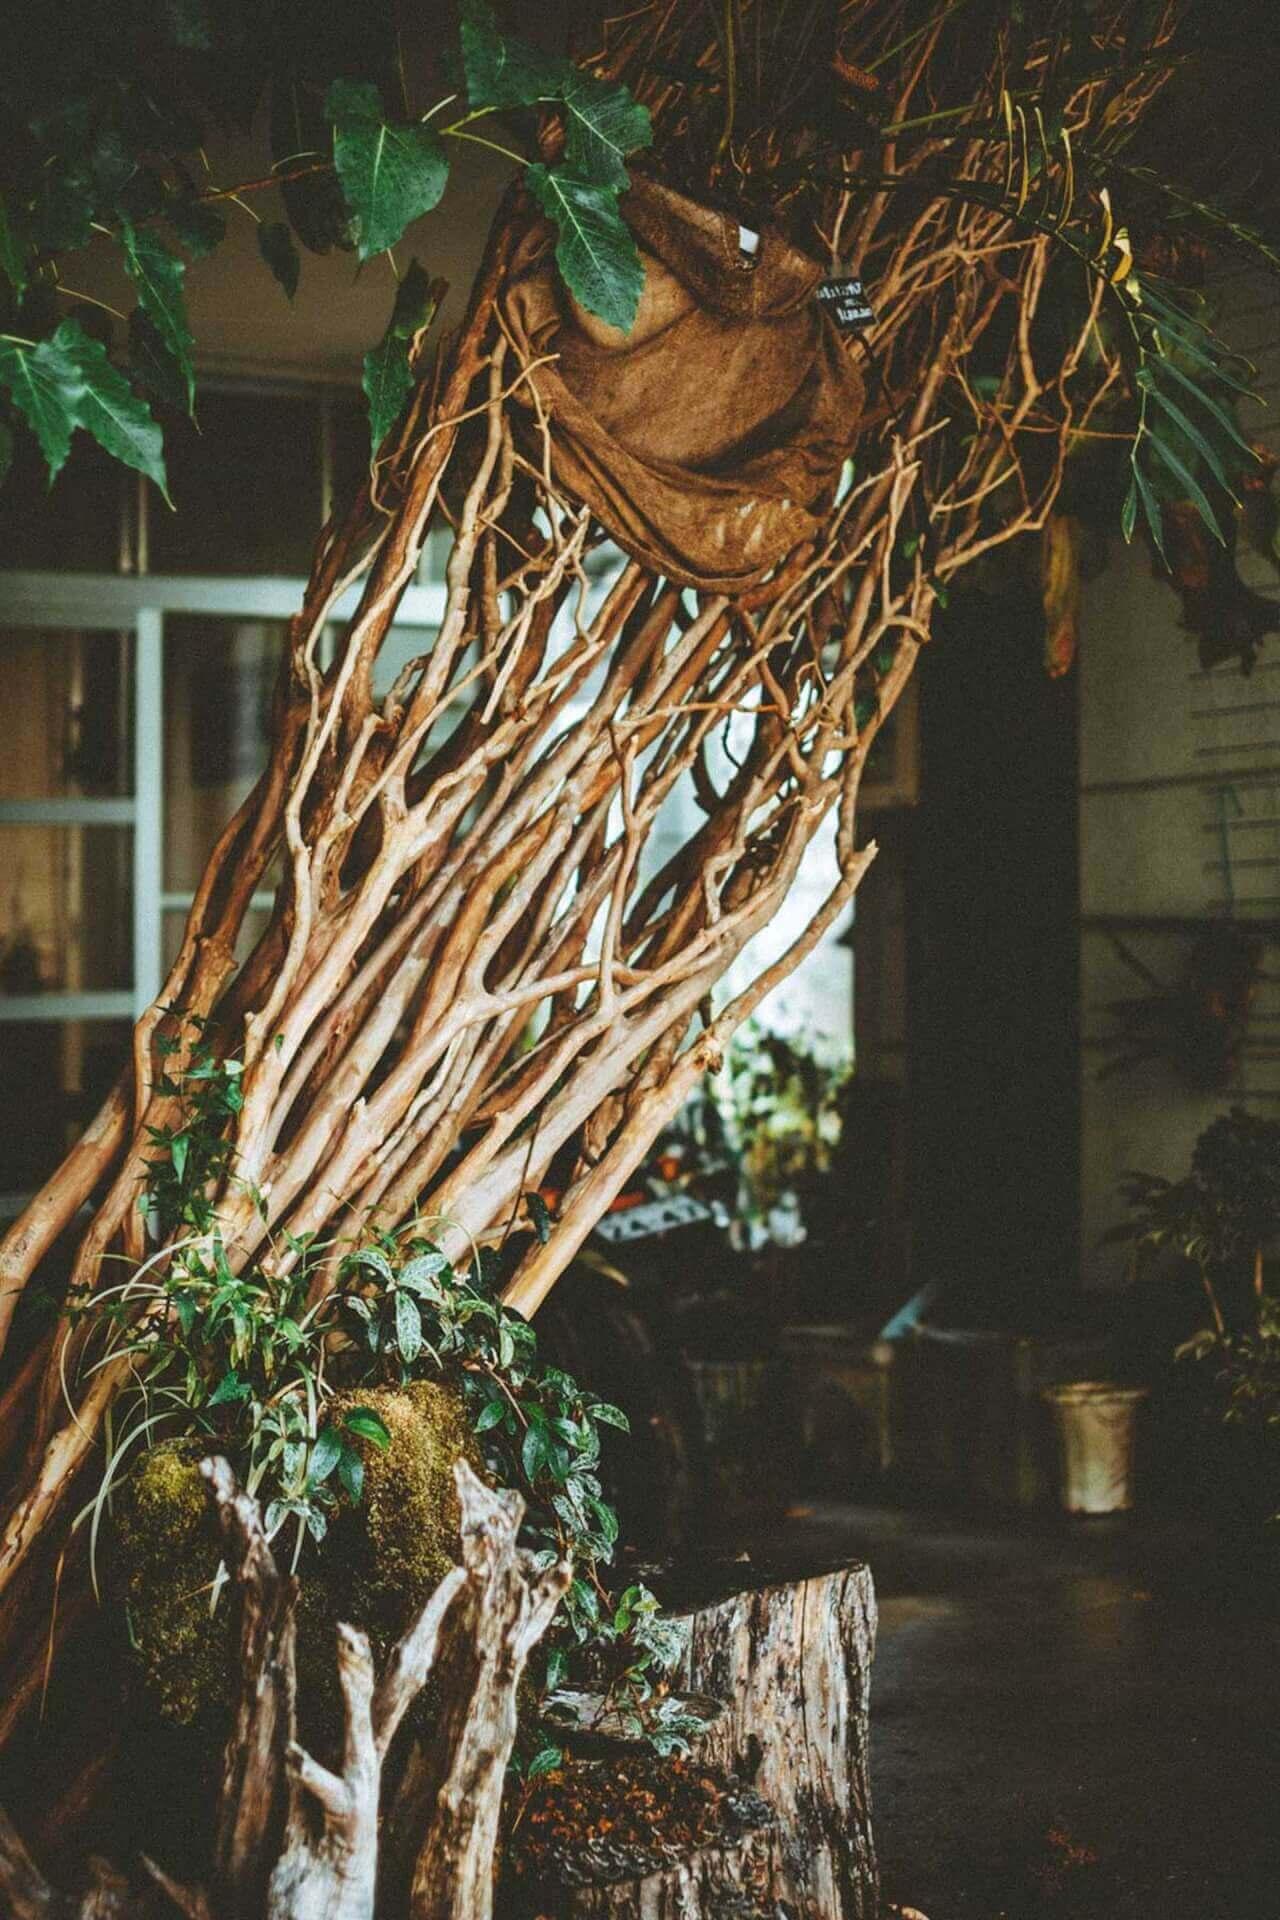 art200925_planb-master-piece_35 ビザールプランツのパイオニア西畠勲造にフォーカスした展示が開催中